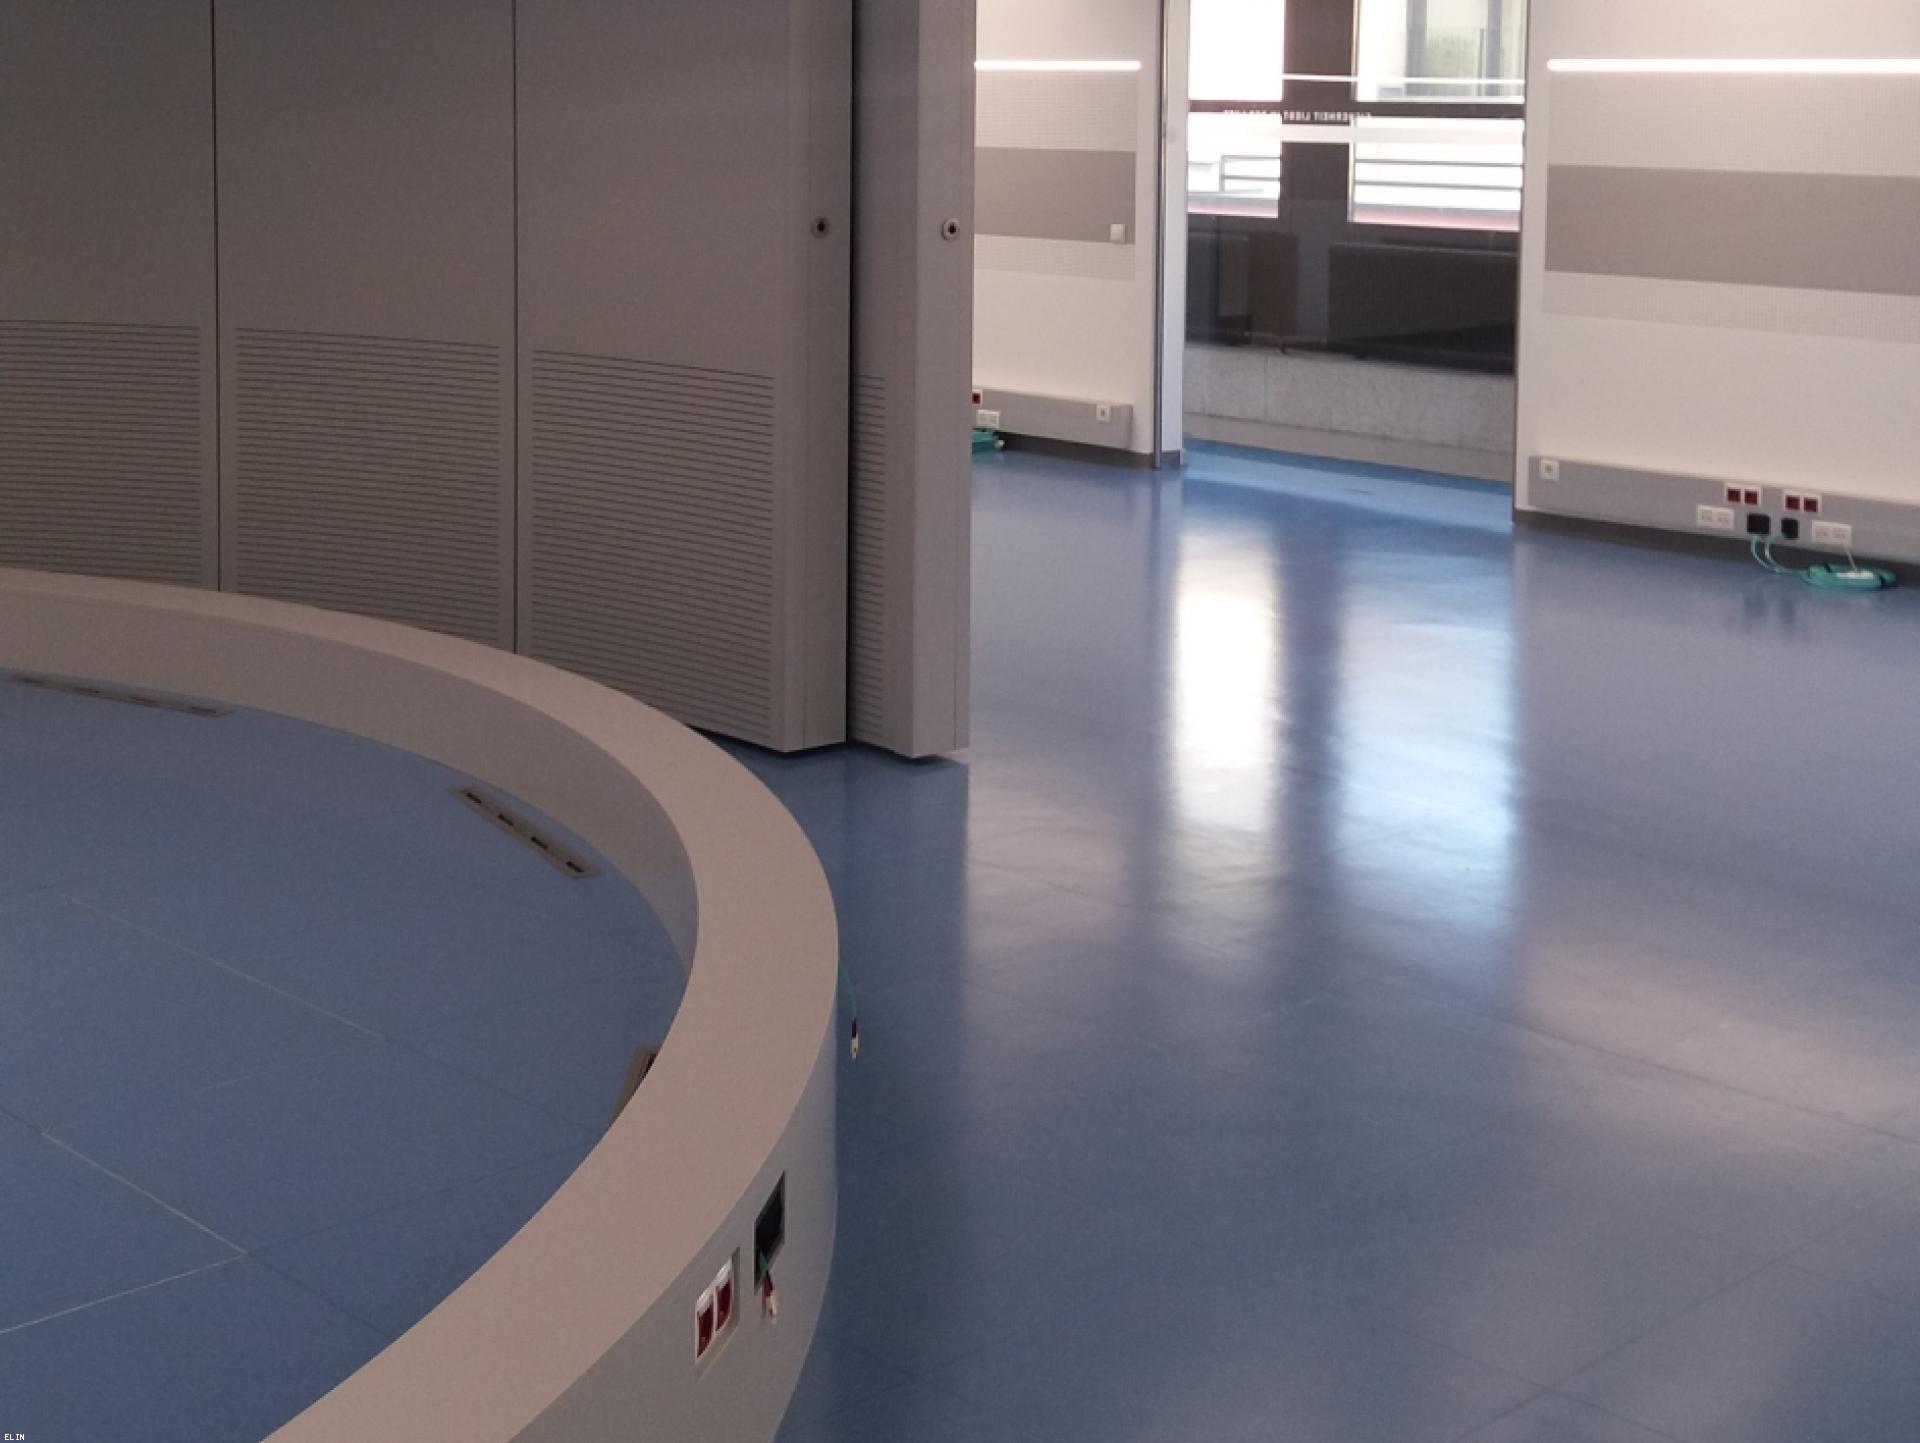 Mood-Image ELIN Referenz: Austro Control GmbH - ATCCV Flugsicherungssimulator